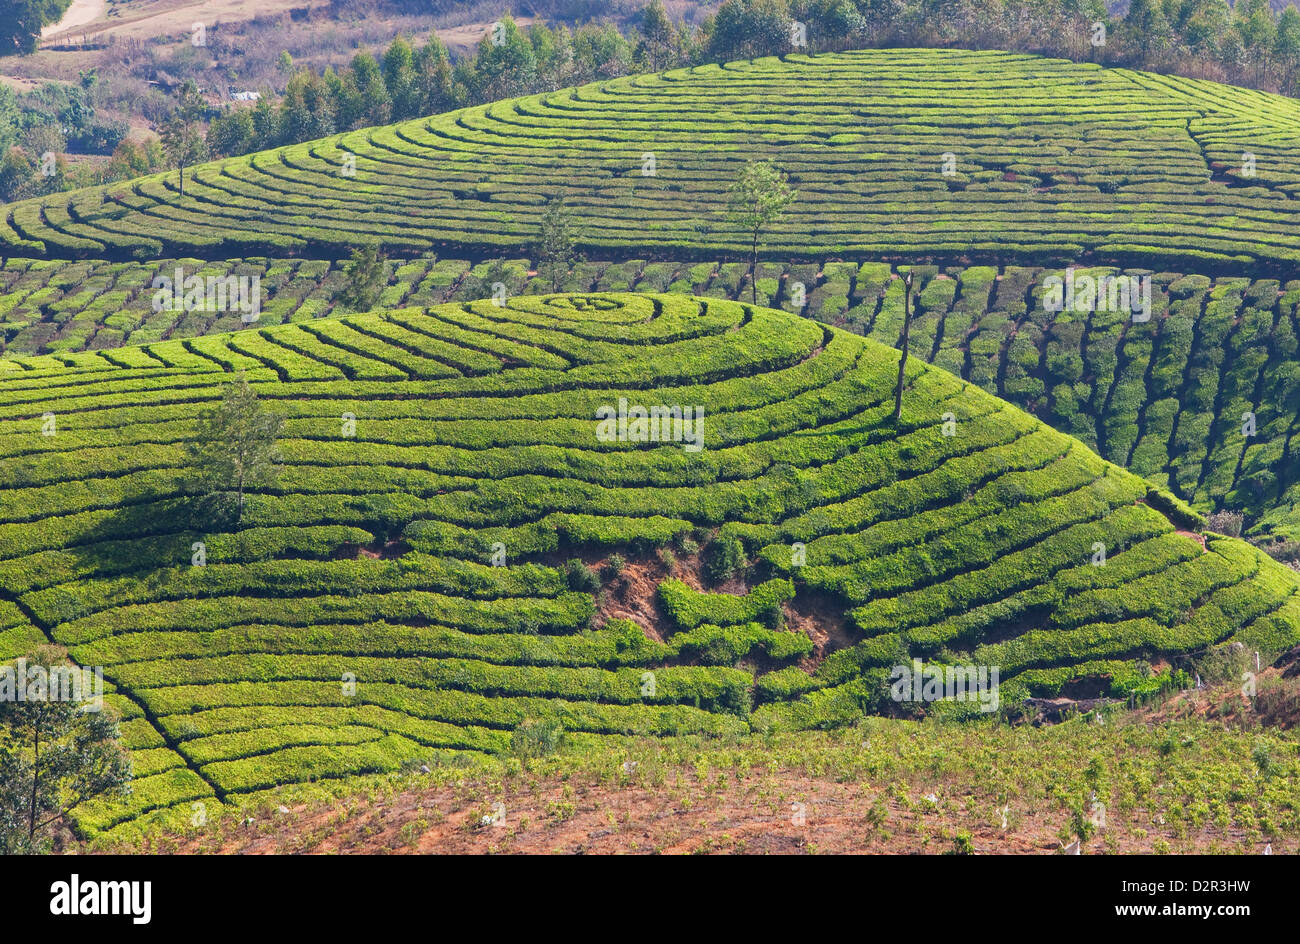 Tea plantation in the mountains of Munnar, Kerala, India, Asia - Stock Image